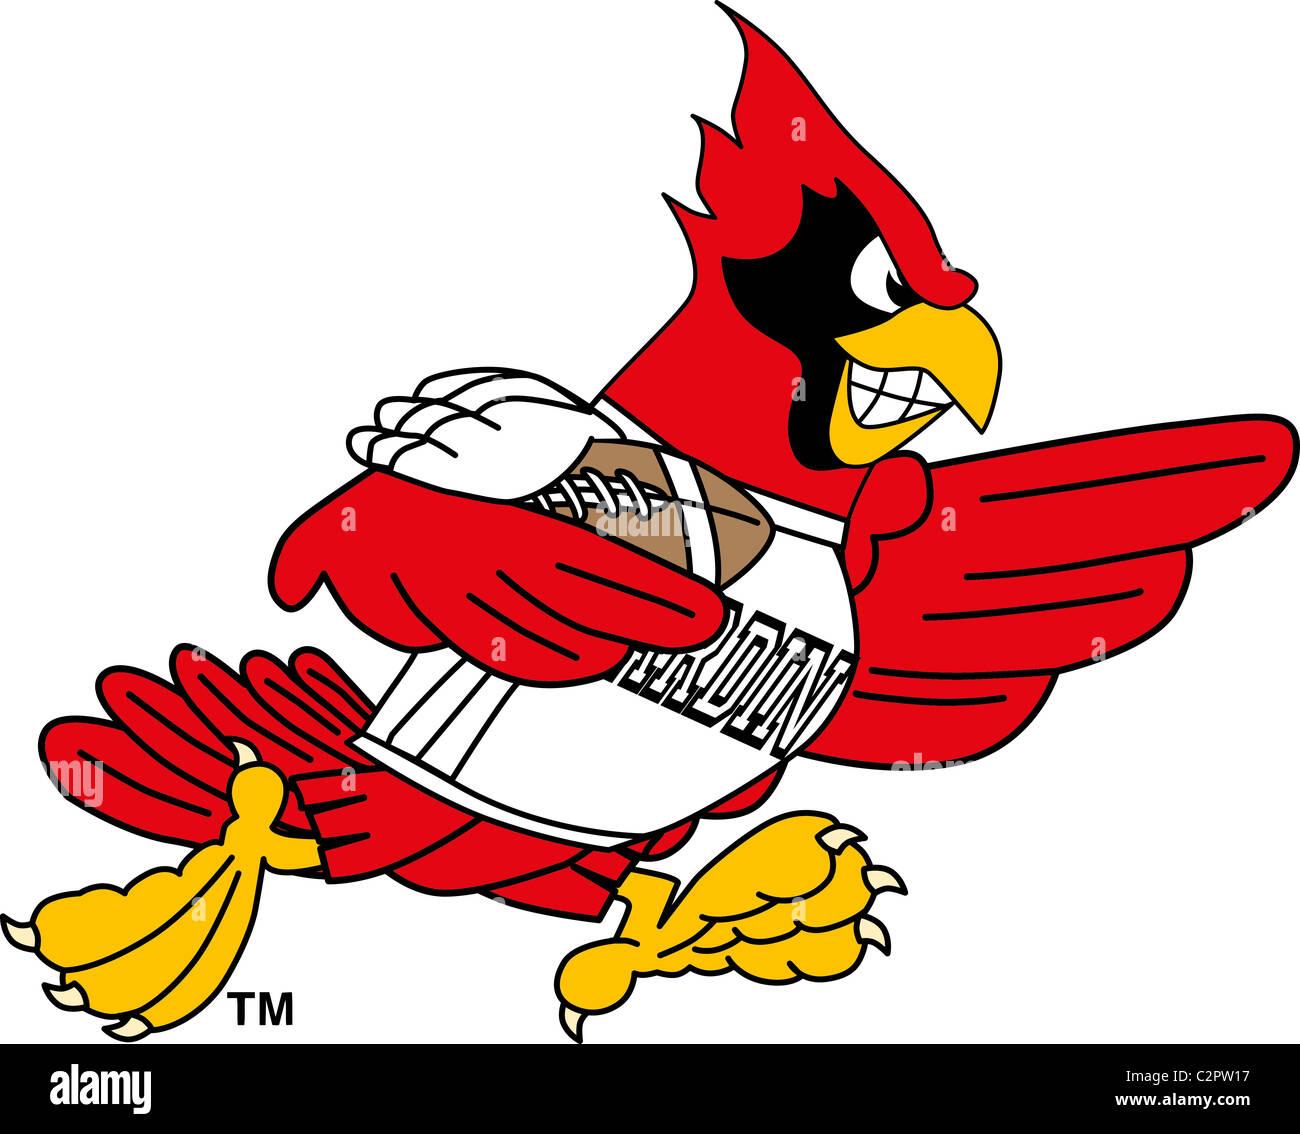 Cartoon Cardinal School Mascot Playing Football Stock Photo